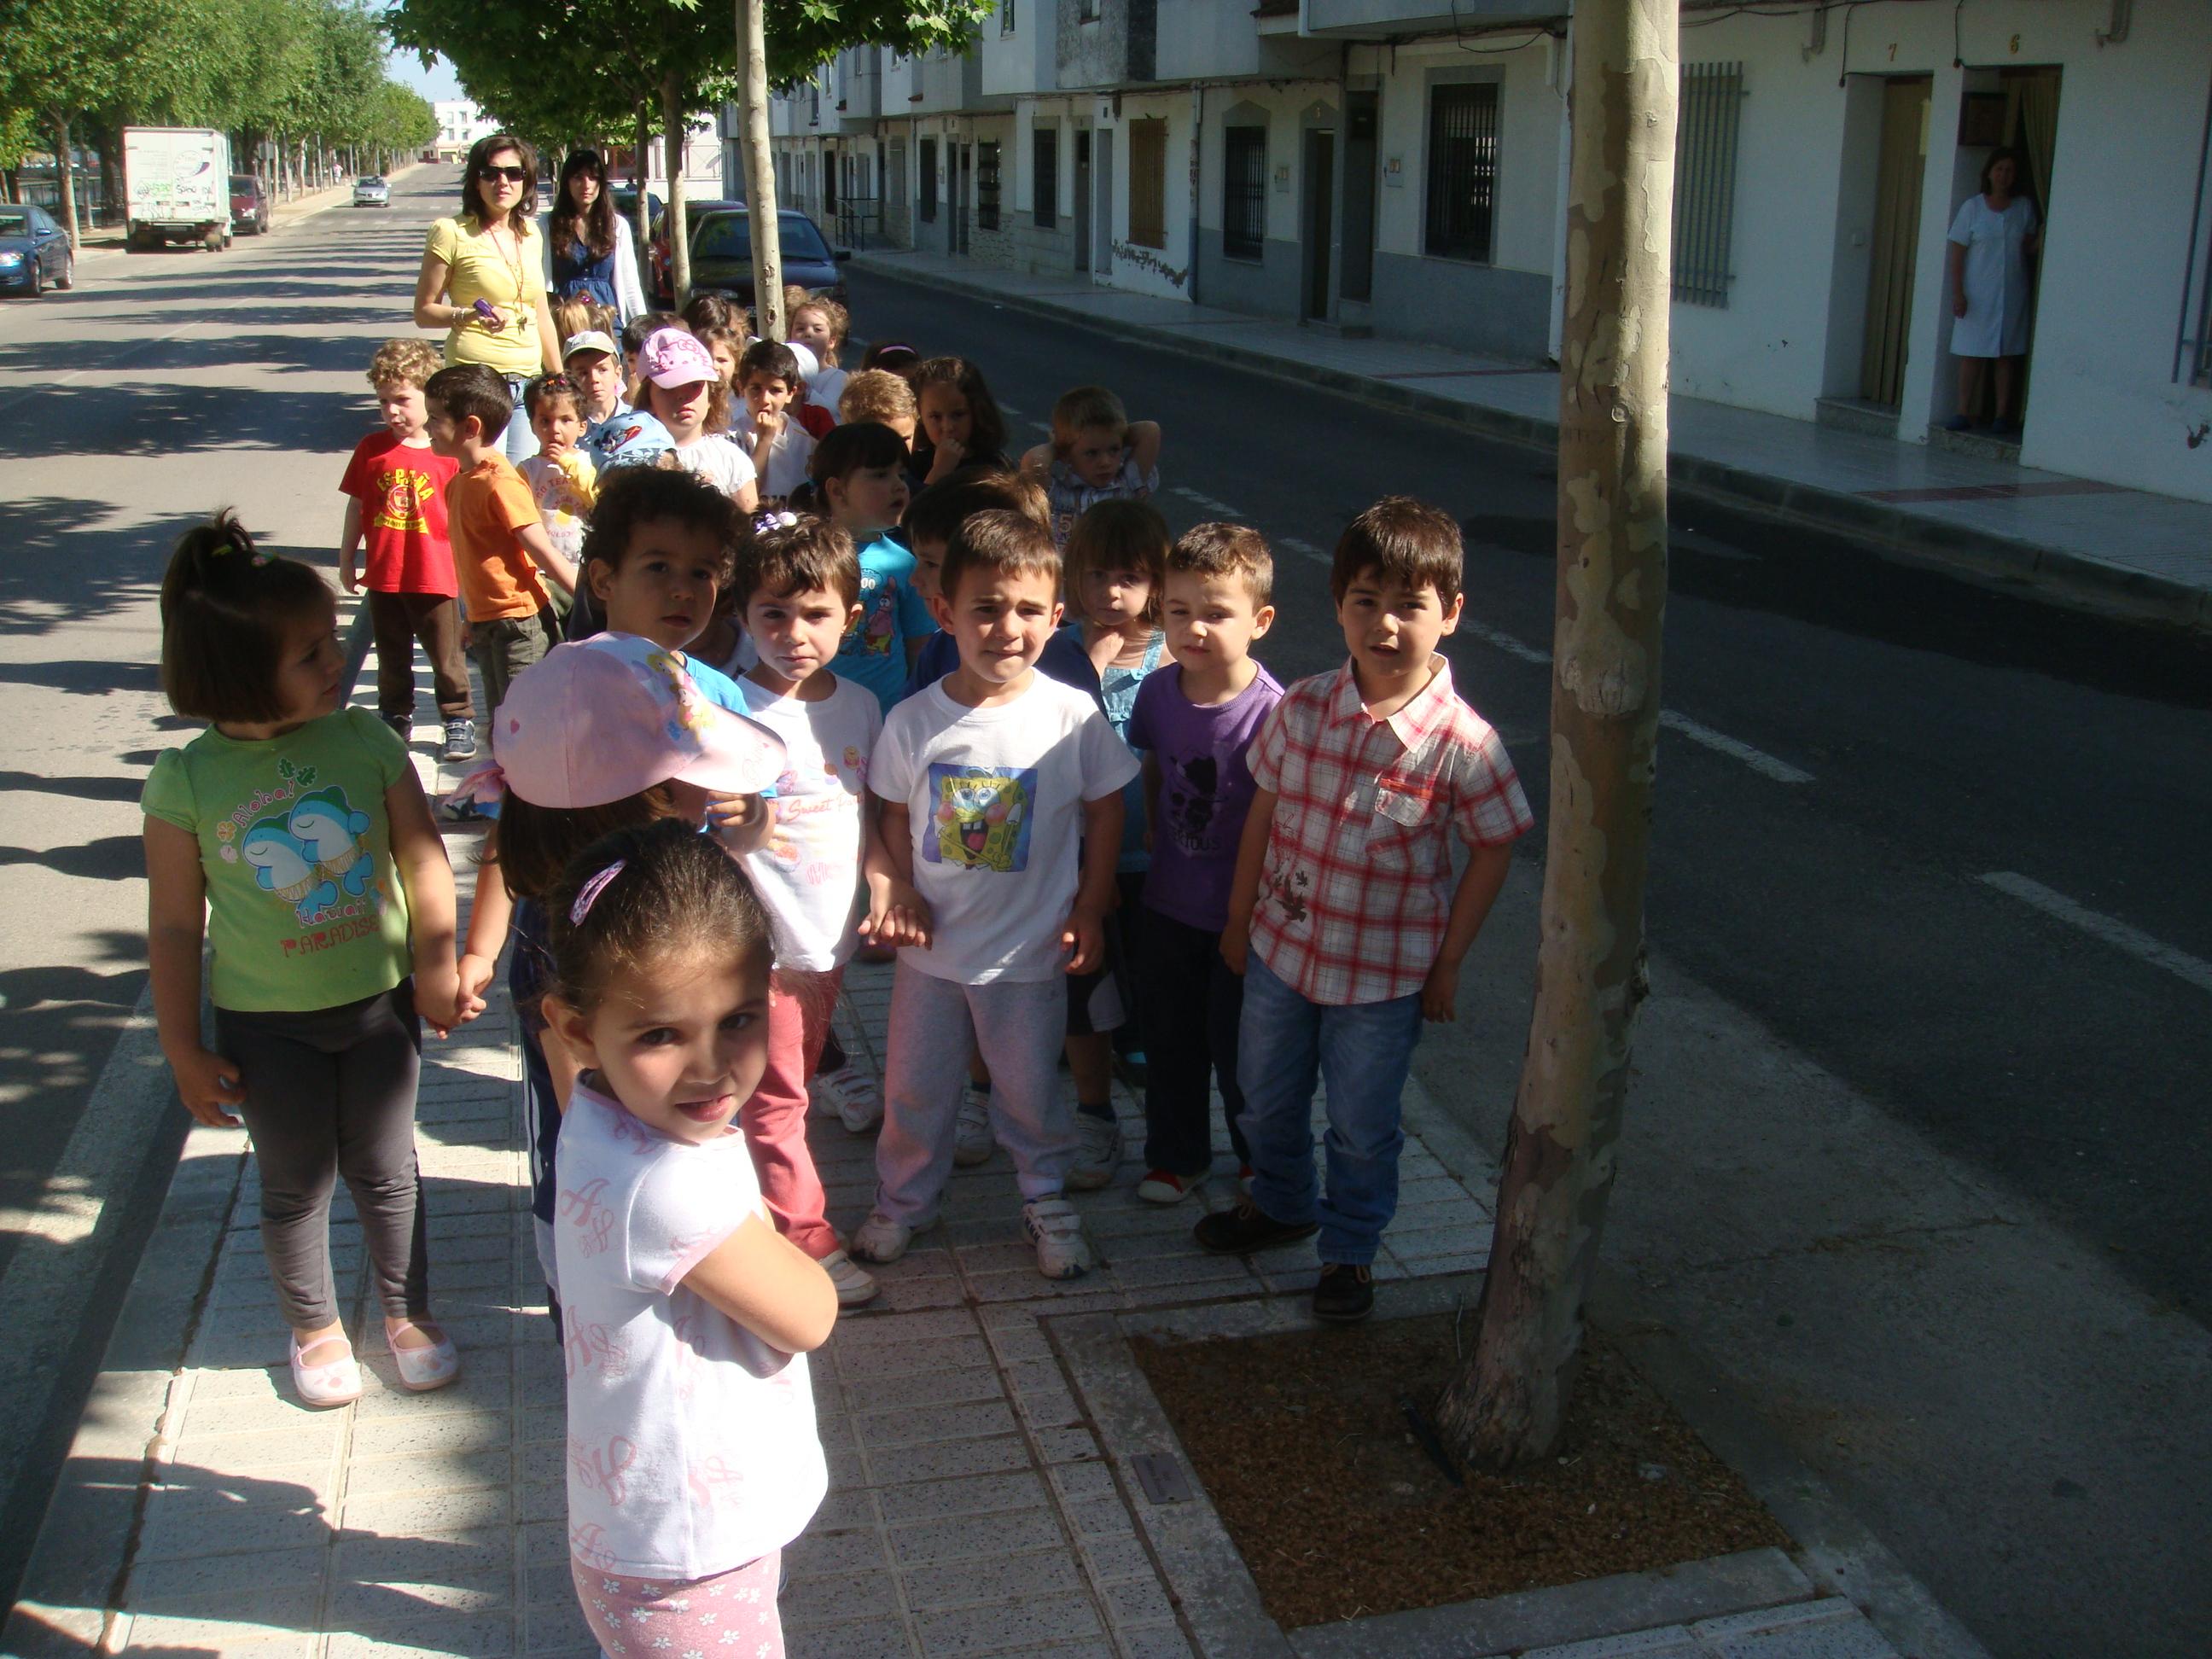 La semana cultural del colegio rinde homenaje a los bosques